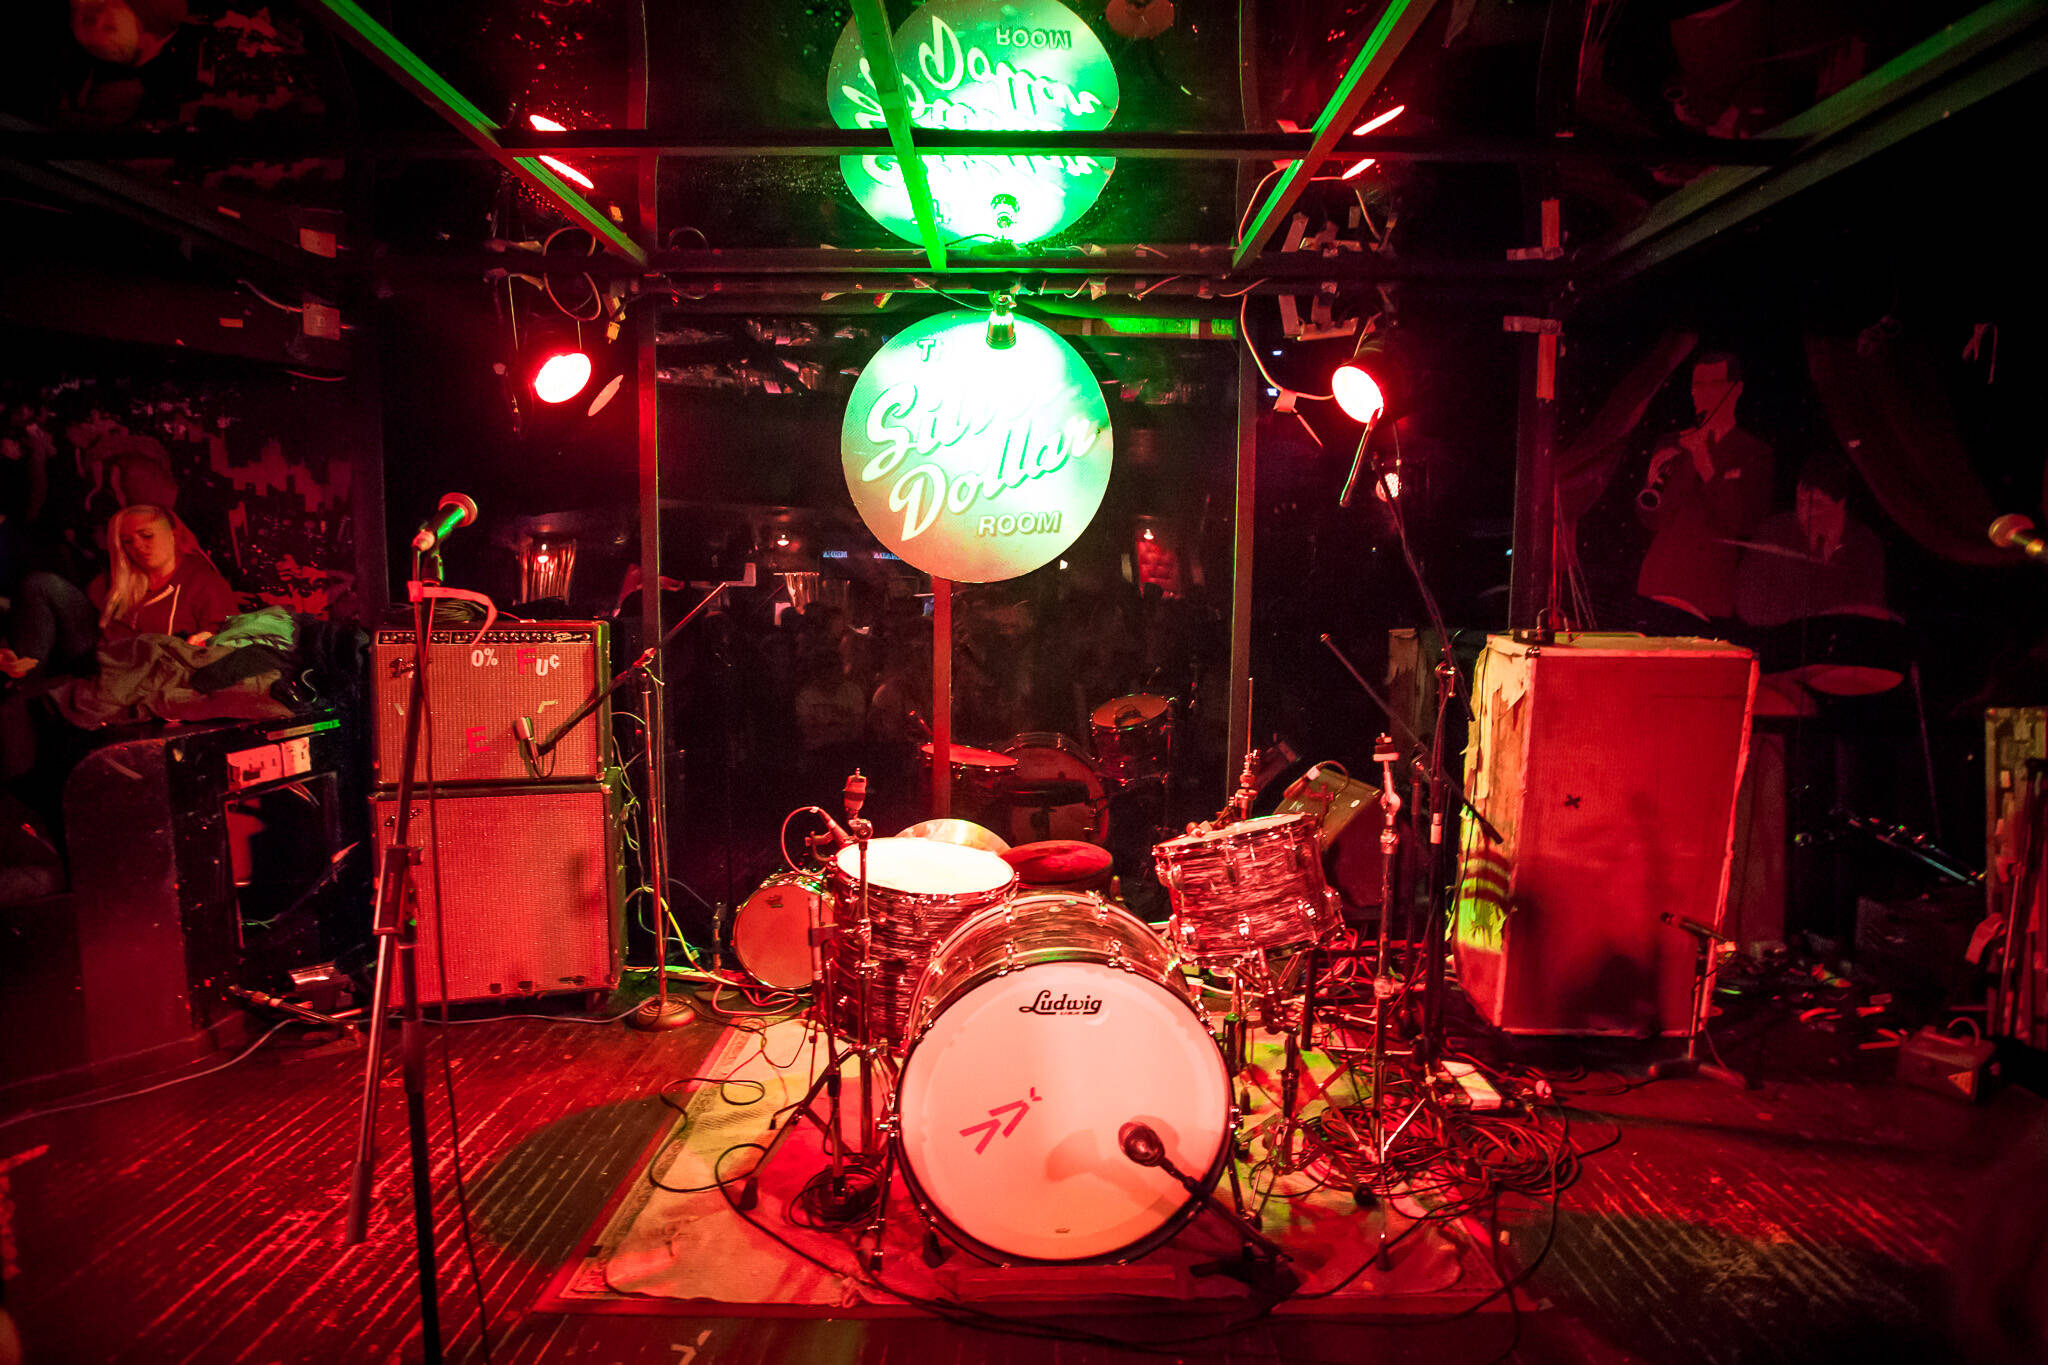 toronto nightclub reopen